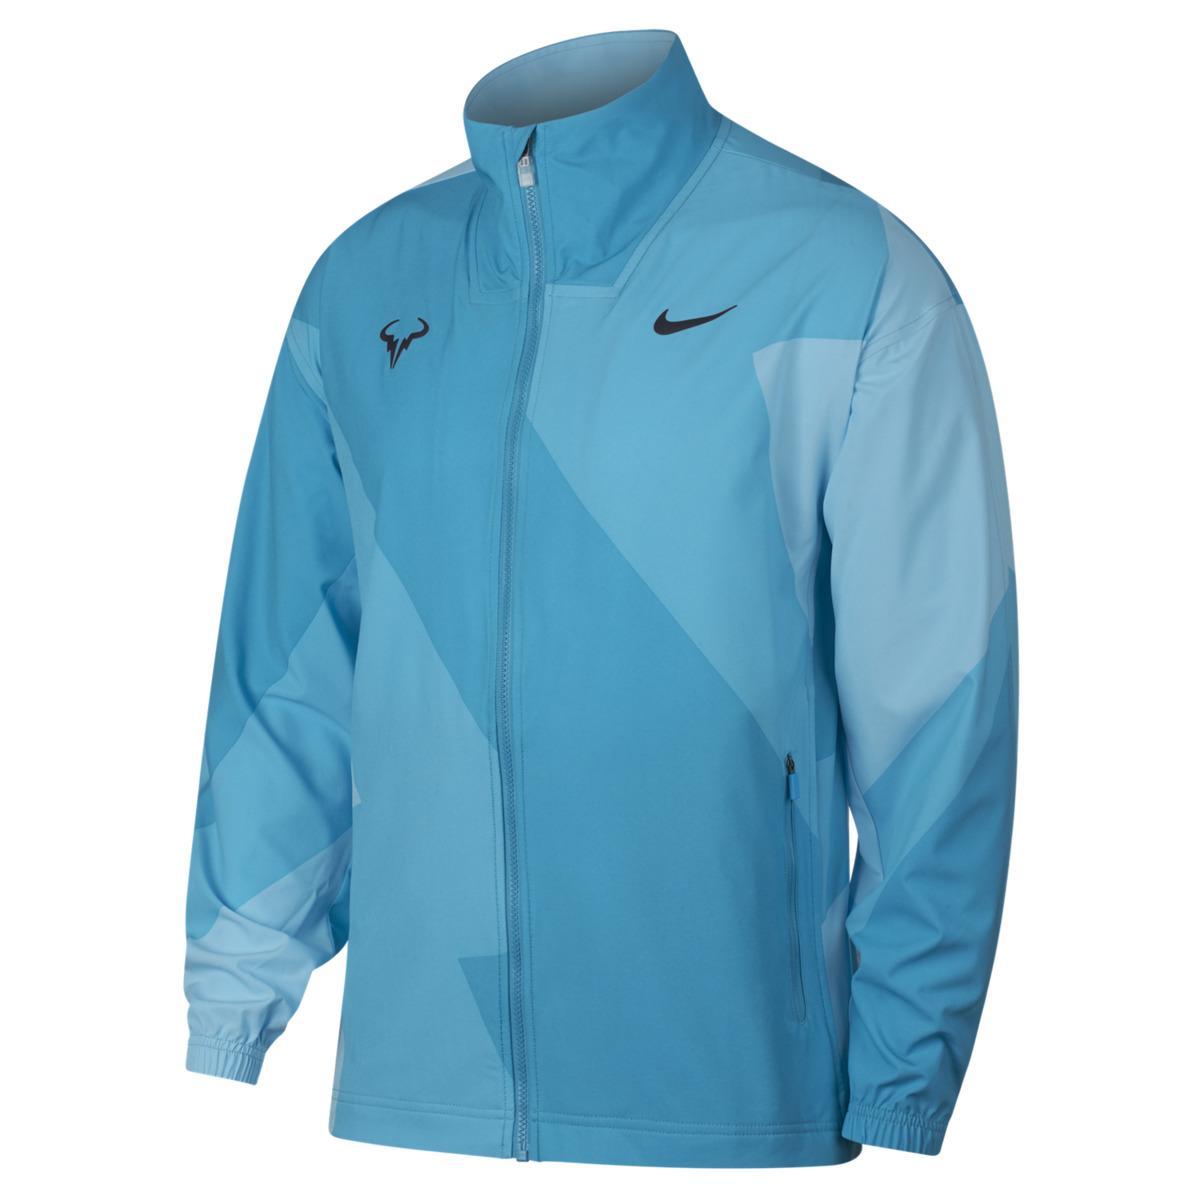 92ee0b0d81bbc Nike. Men s Blue Chaqueta De Hombre Court Rafa. £104 From El Corte Ingles